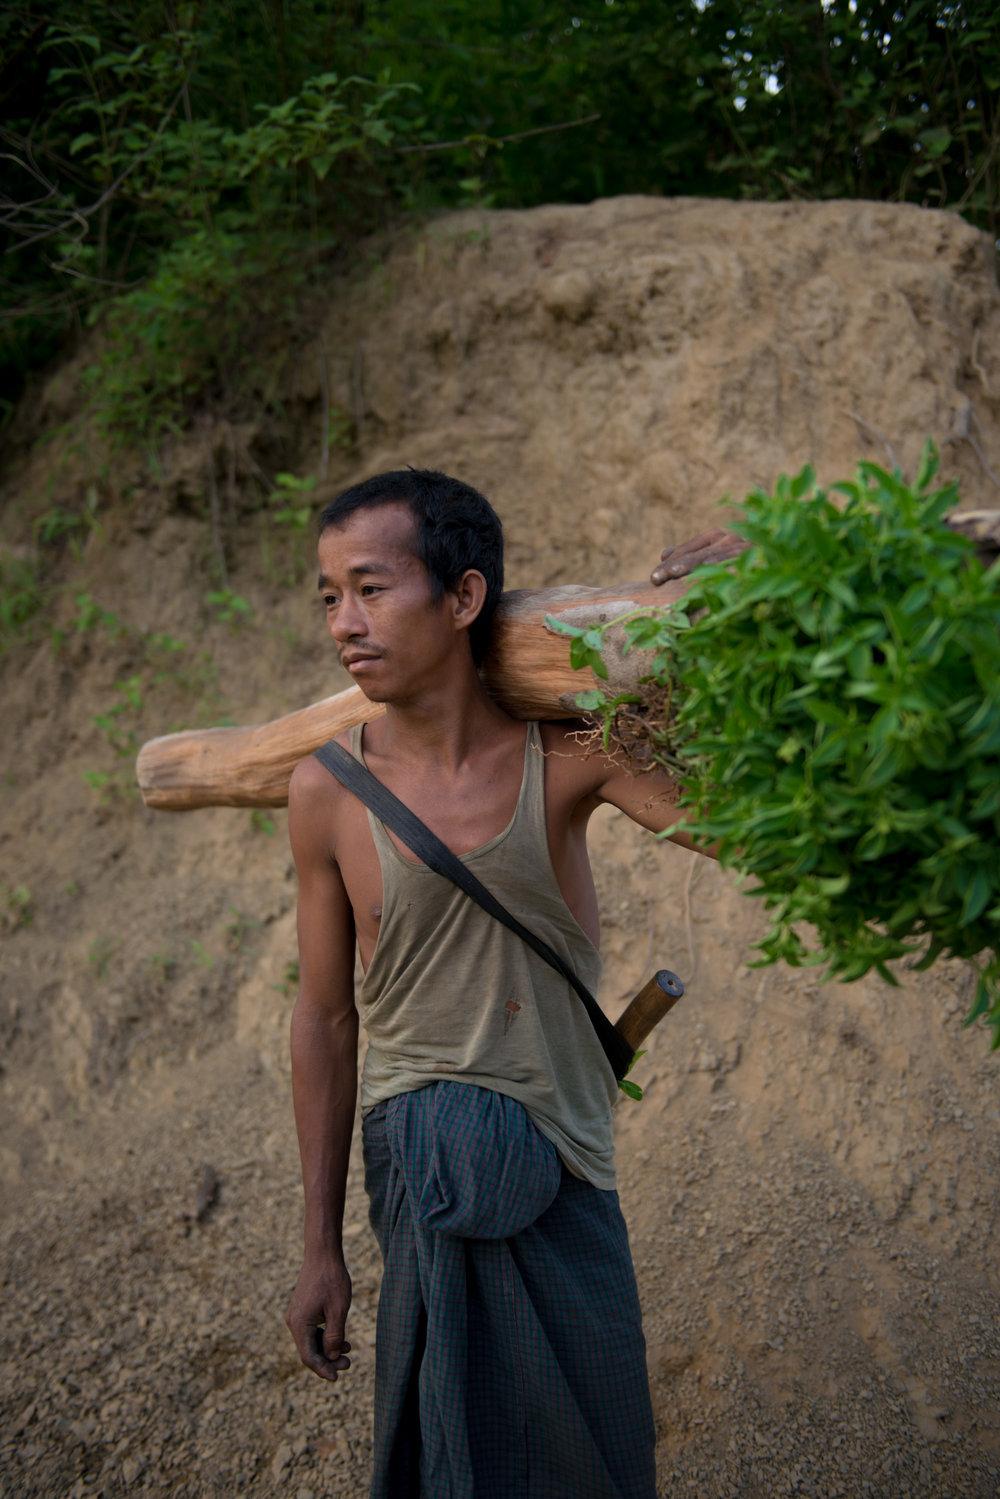 13_Chhandak Pradhan-Reportage-The_Promise_of_Asphalt-Border_road_NE India_Burma_Le Monde.jpg